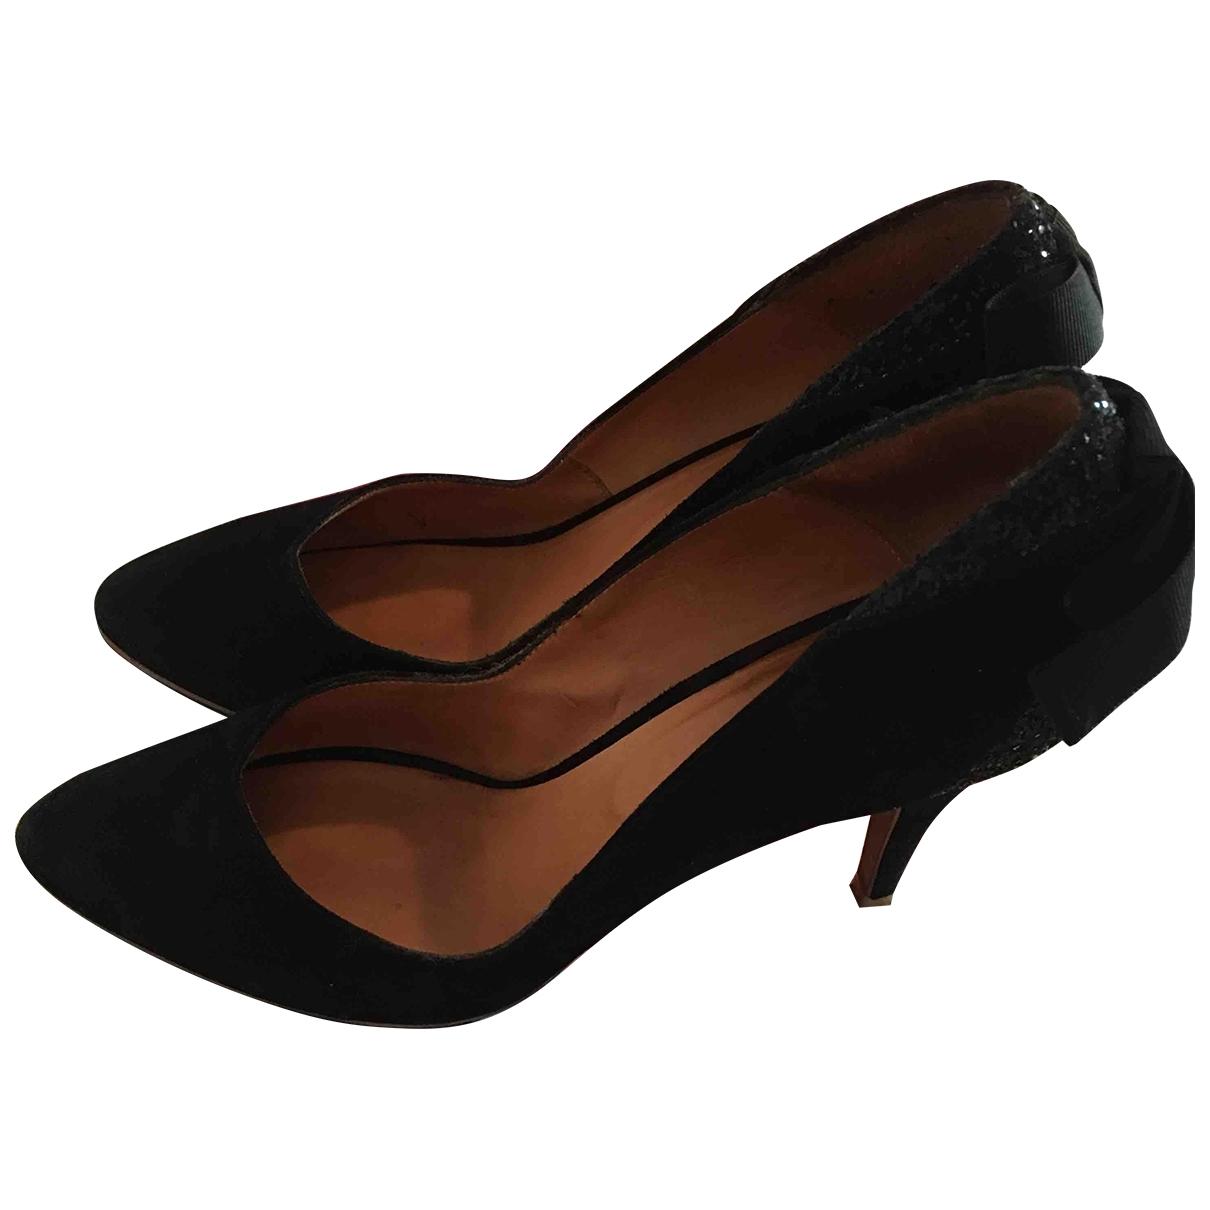 Sézane \N Black Suede Heels for Women 40 EU